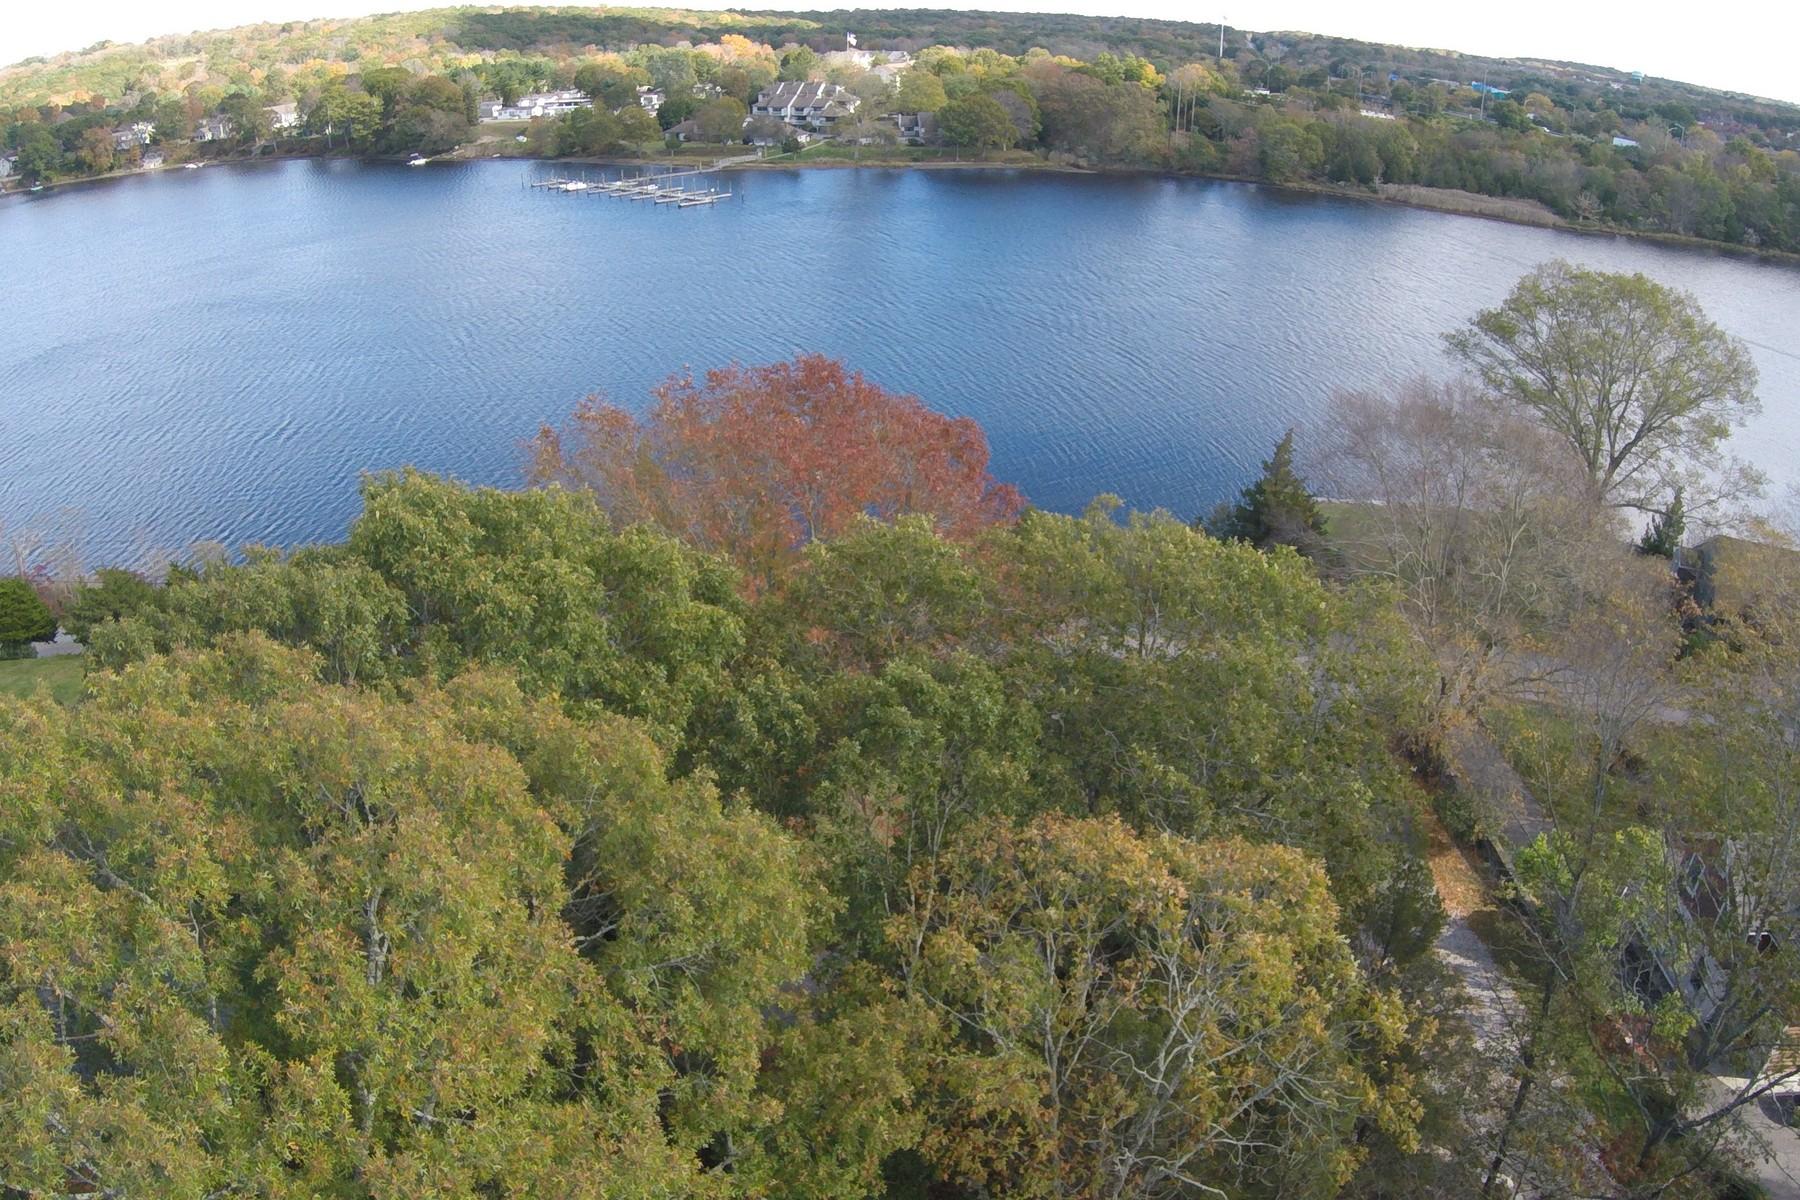 Terreno por un Venta en Amazing River Views 743-1 River Rd Groton, Connecticut 06355 Estados Unidos